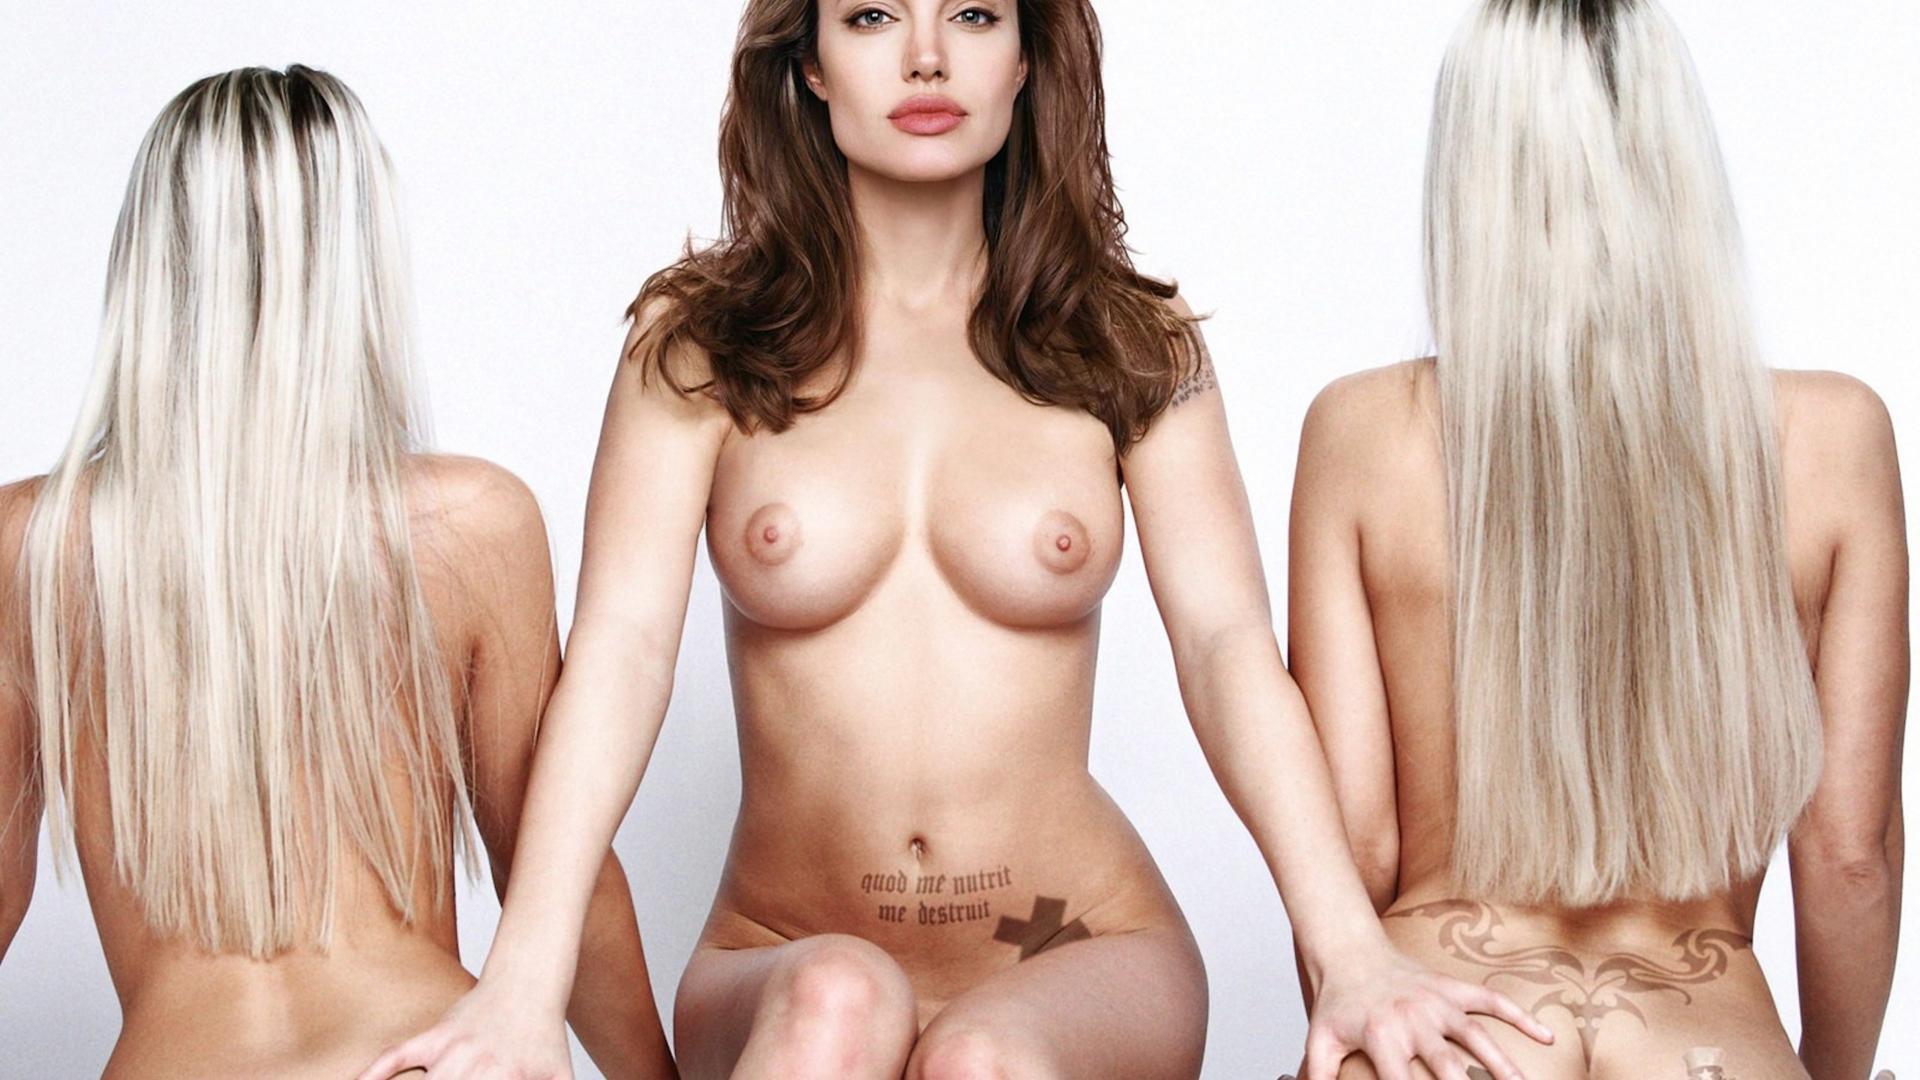 Naked female celebrities naked pics